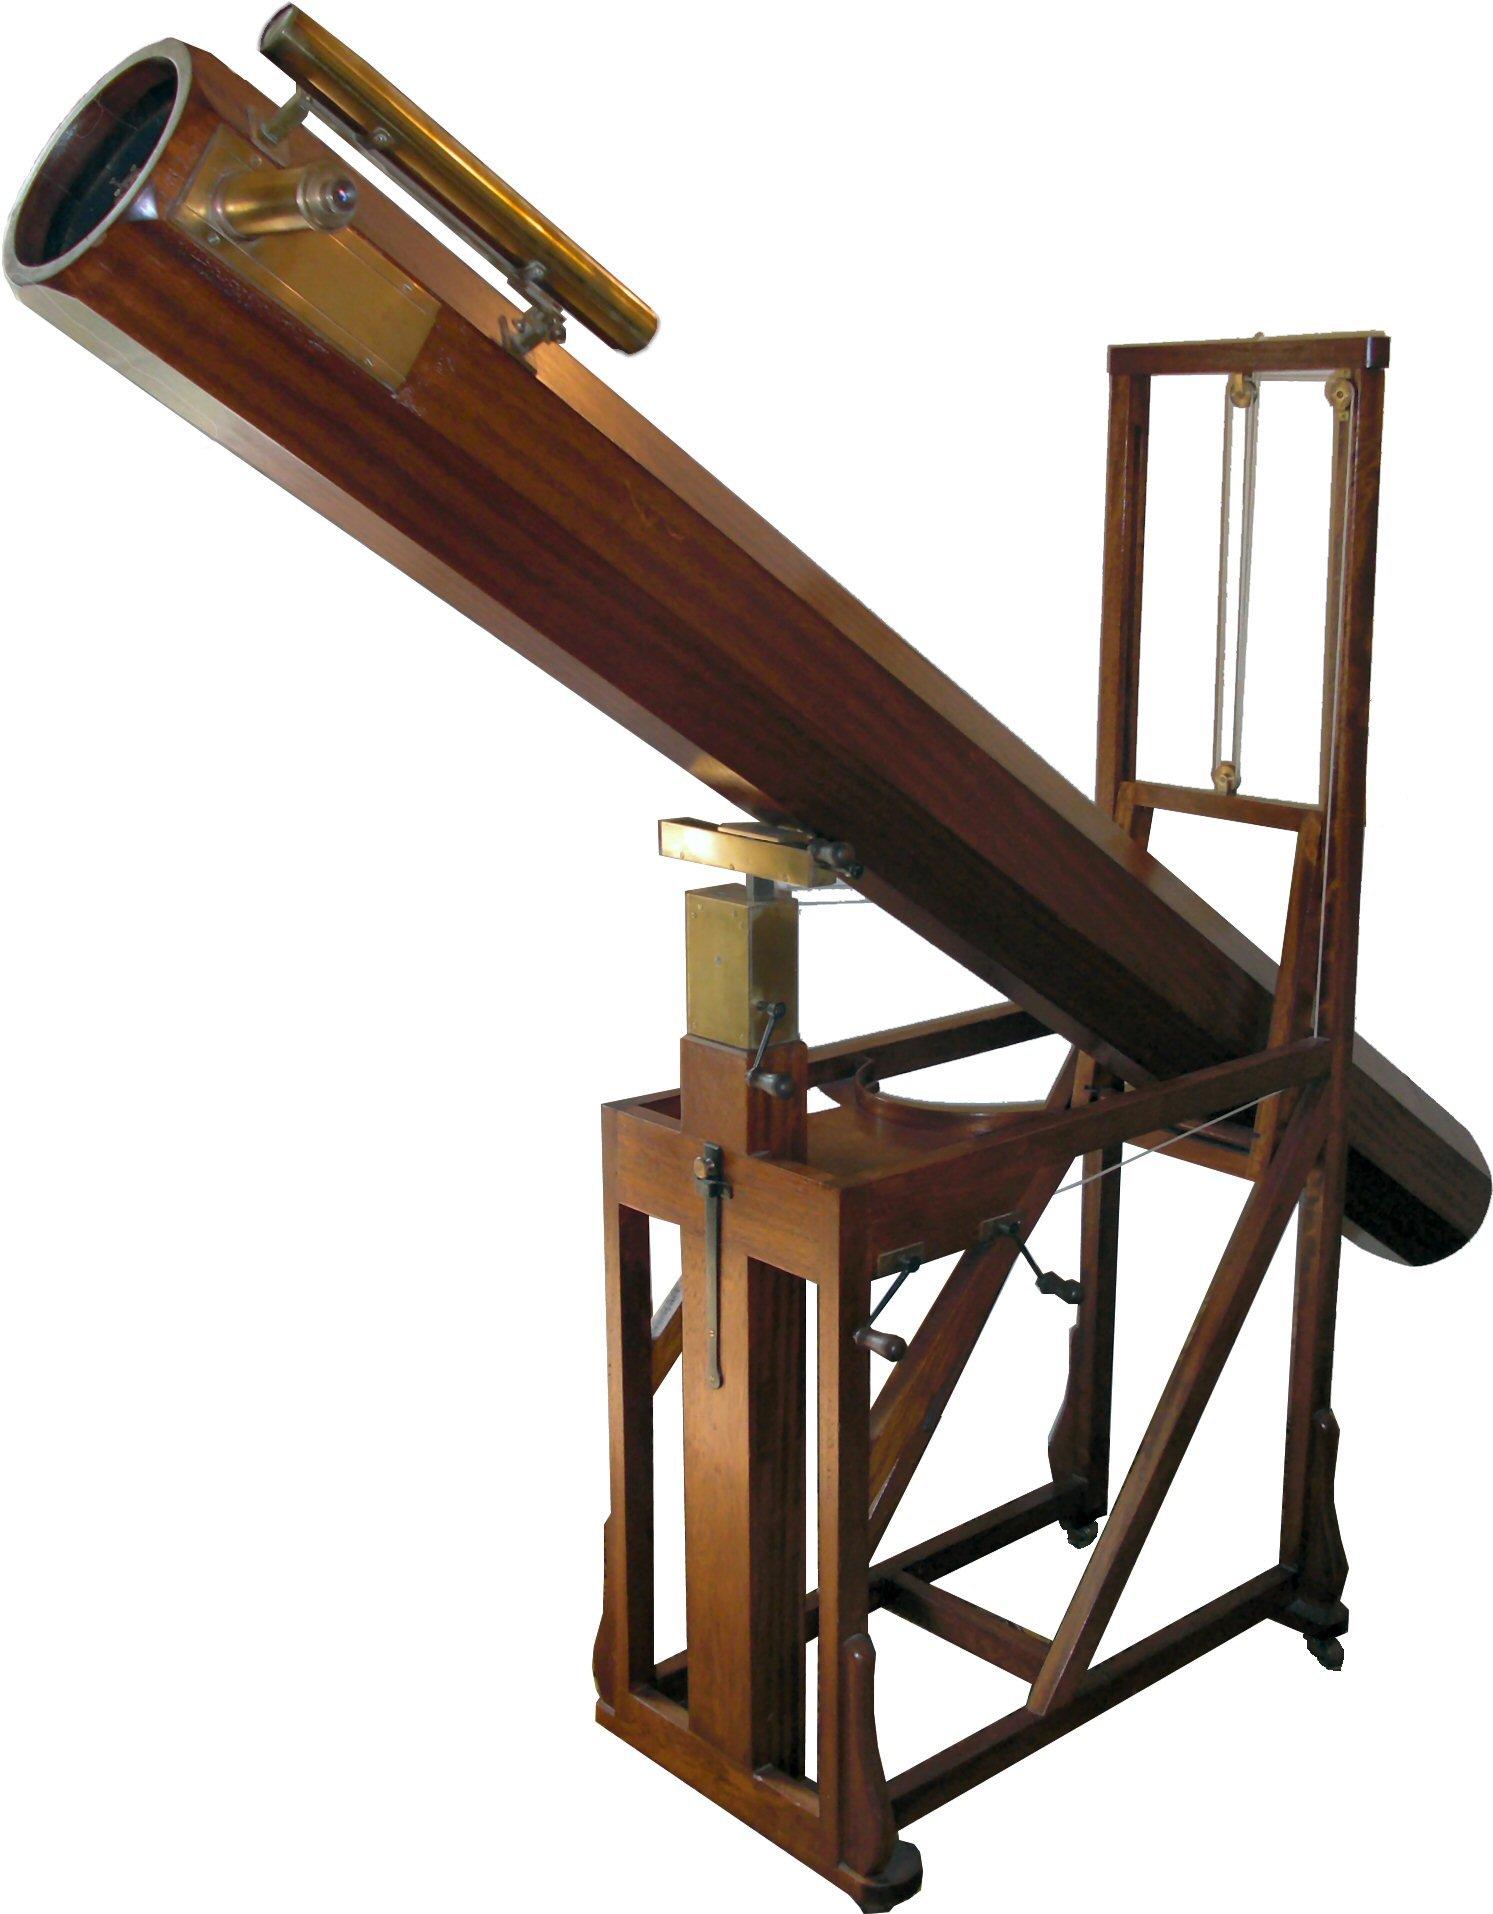 table wood telescope shelf furniture lighting product astronomy observation man made object william herschel herschel telescope